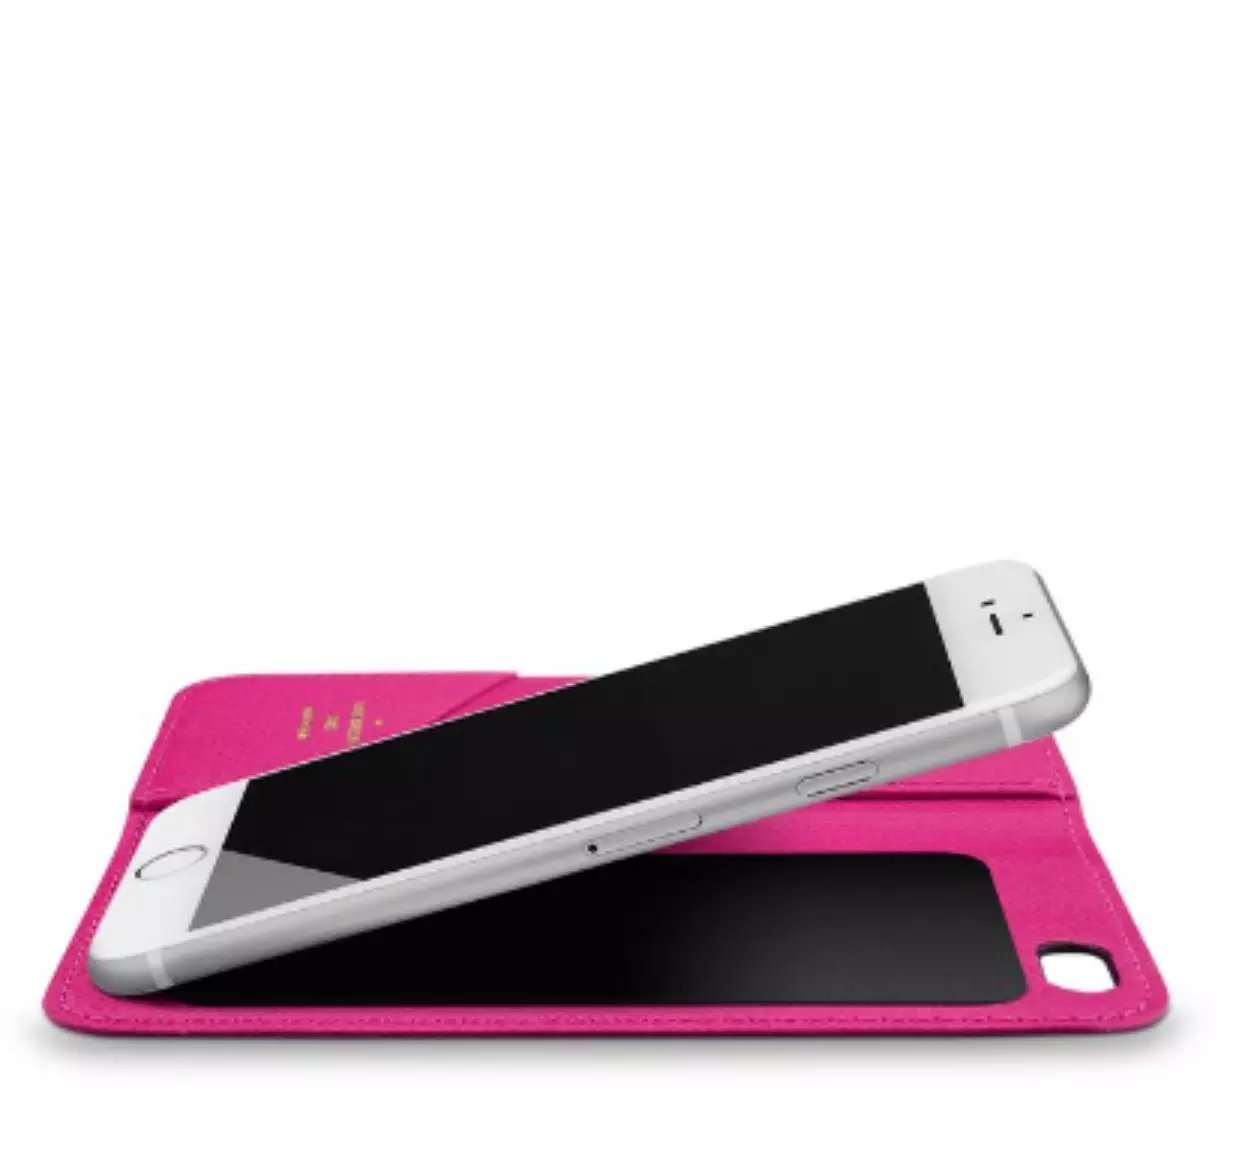 iphone case selbst gestalten handyhülle foto iphone Louis Vuitton iphone6 hülle iphone ca6 6lbst gestalten günstig iphone 6 klapphülle iphone zoll neues iphone apple samsung ca6 6lbst gestalten individuelle smartphone hülle